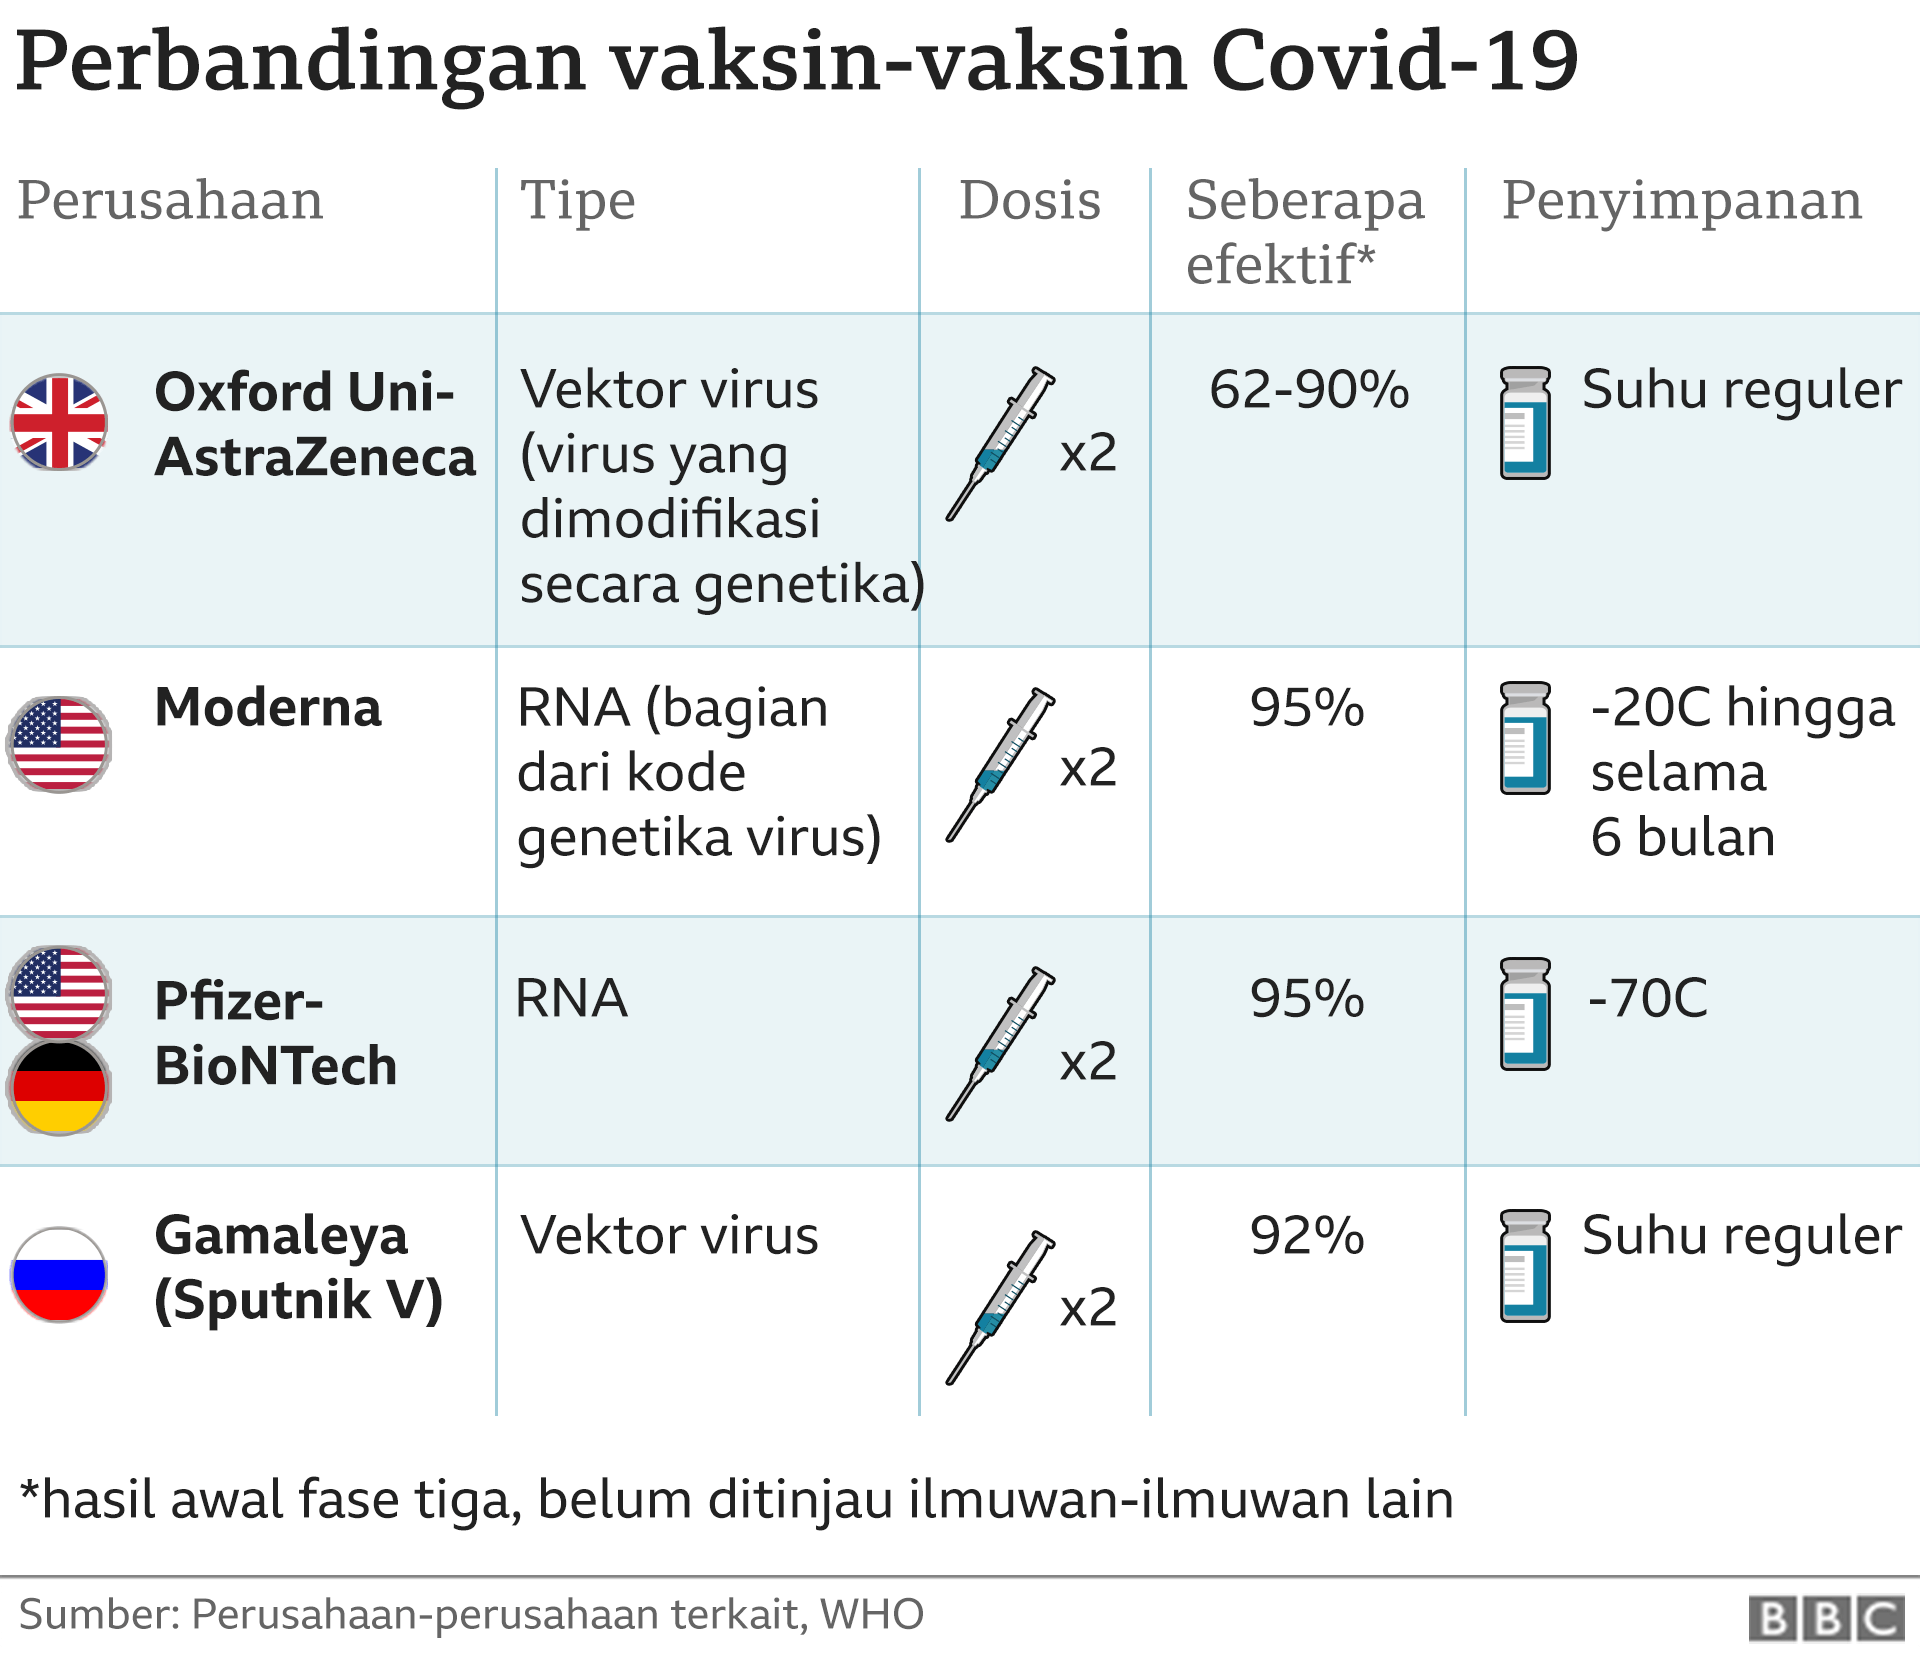 Vaksin Covid 19 Nenek Berusia 90 Tahun Jadi Orang Pertama Dunia Yang Divaksin Inggris Hadapi Tantangan Logistik Sangat Besar Bbc News Indonesia